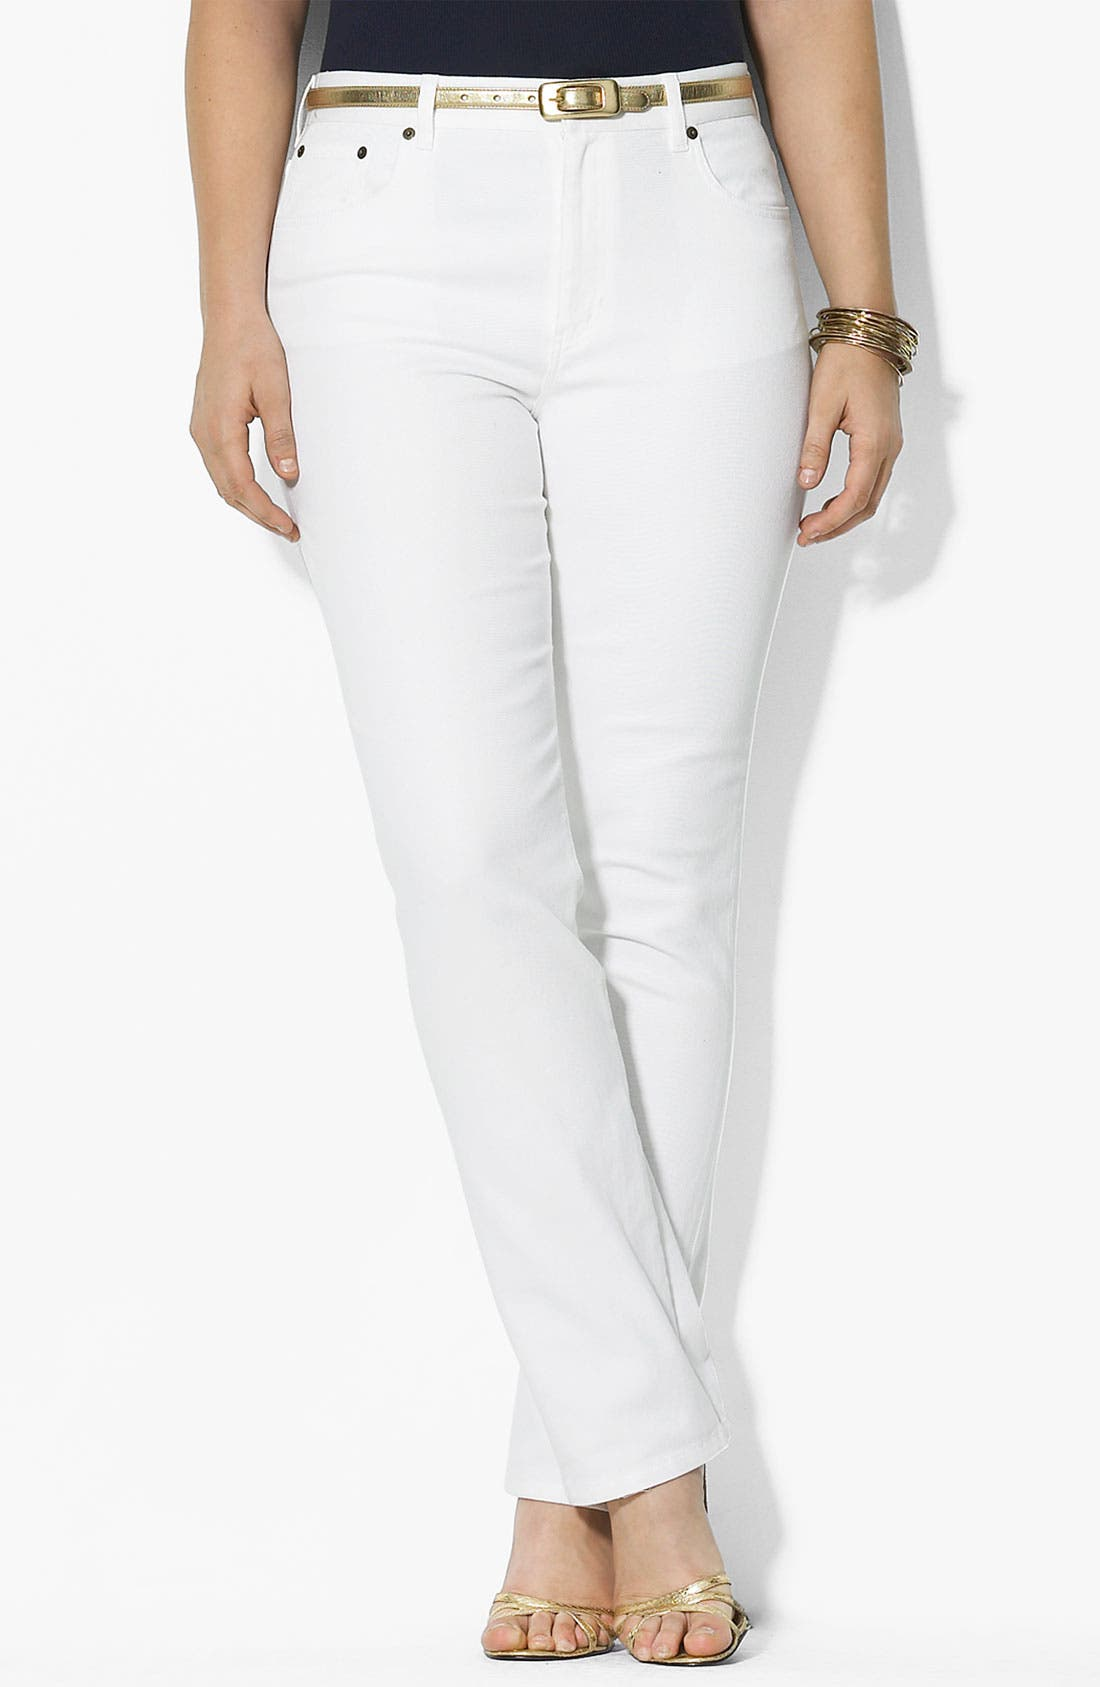 Alternate Image 1 Selected - Lauren Ralph Lauren Straight Leg Jeans (Plus)